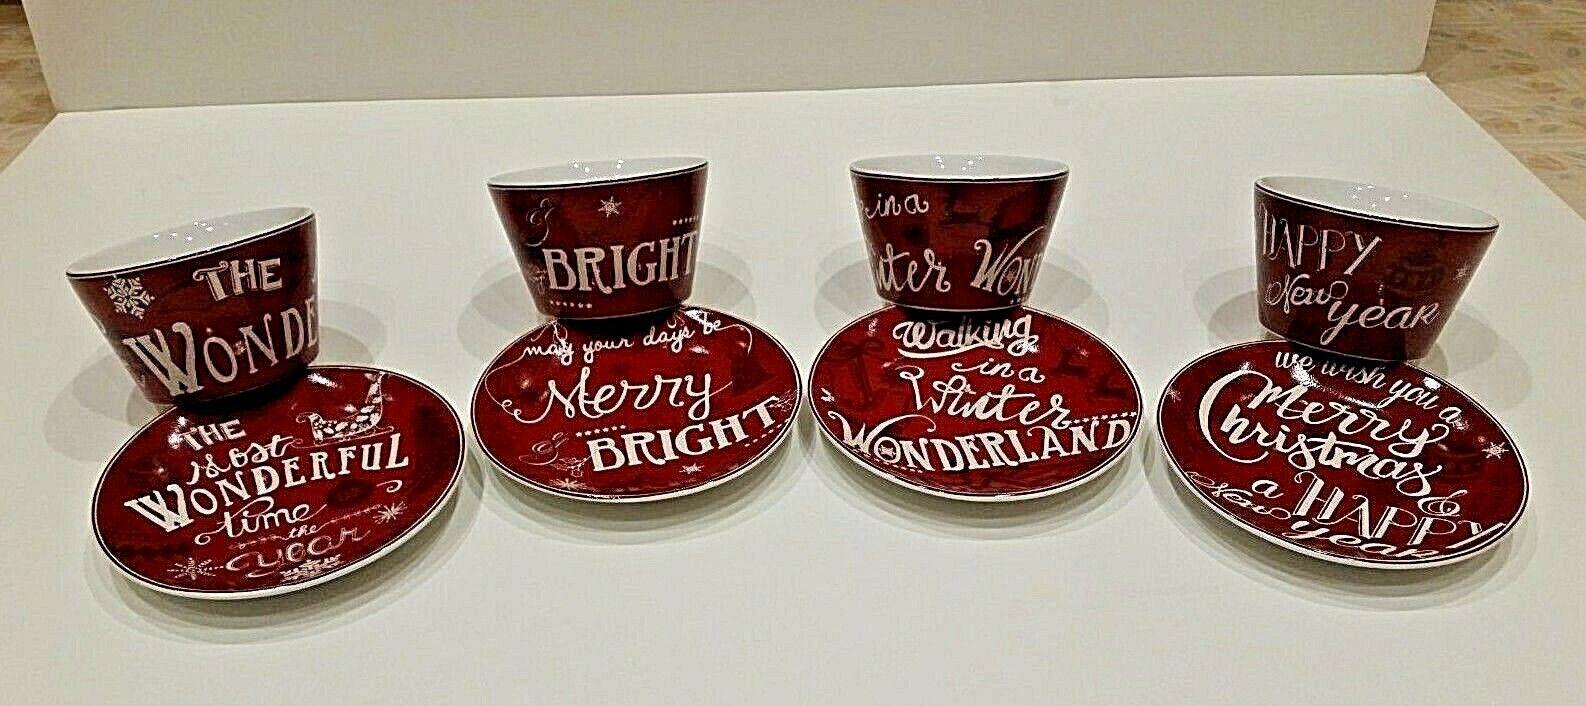 222 Fifth Christmas Tunes Holiday Porcelain Appetizer Plates Dessert Bowls Set